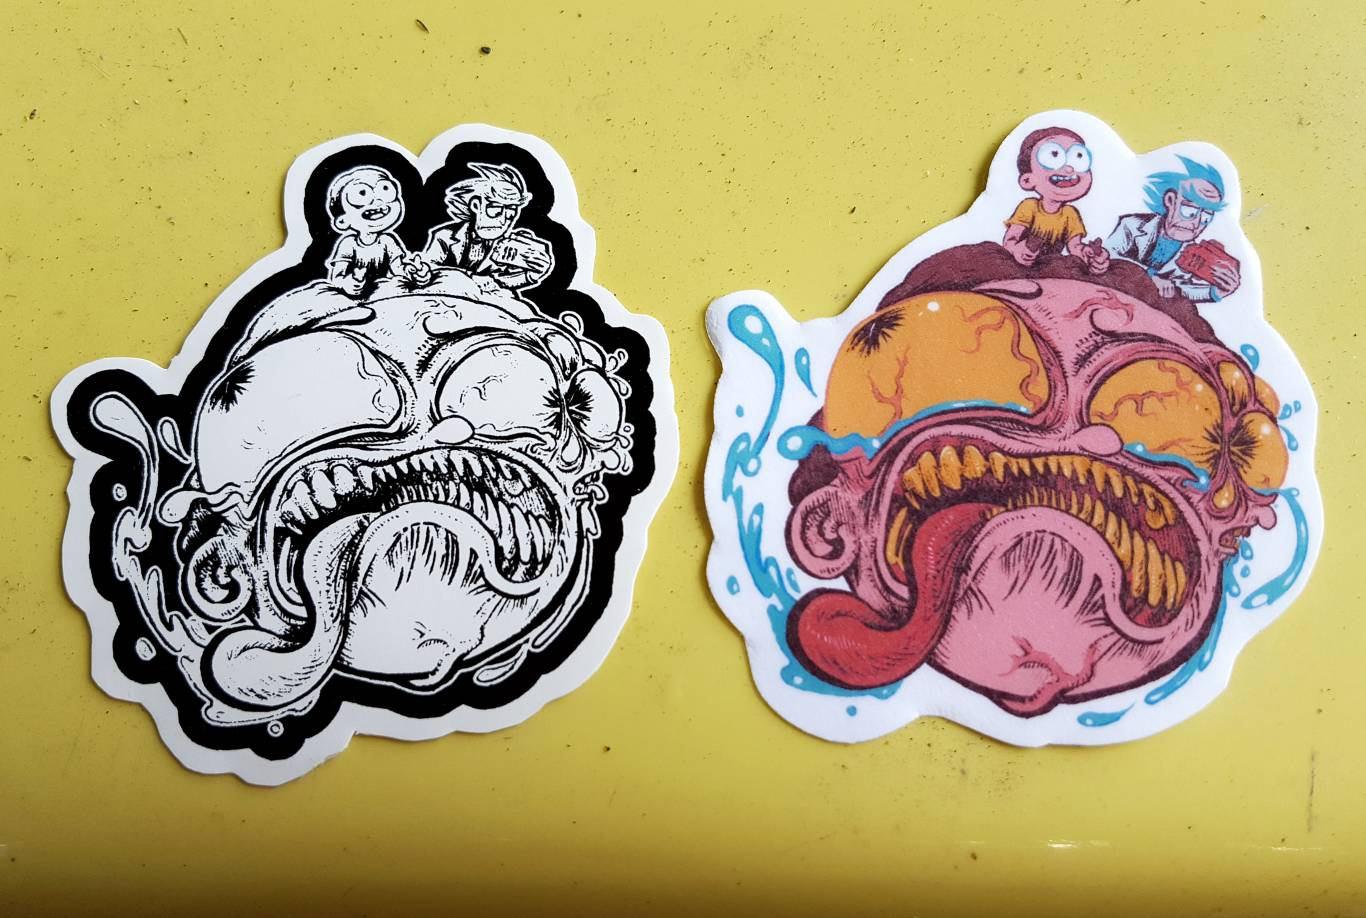 STICKER: Rick and Morty sticker big head Morty Pocket | Etsy